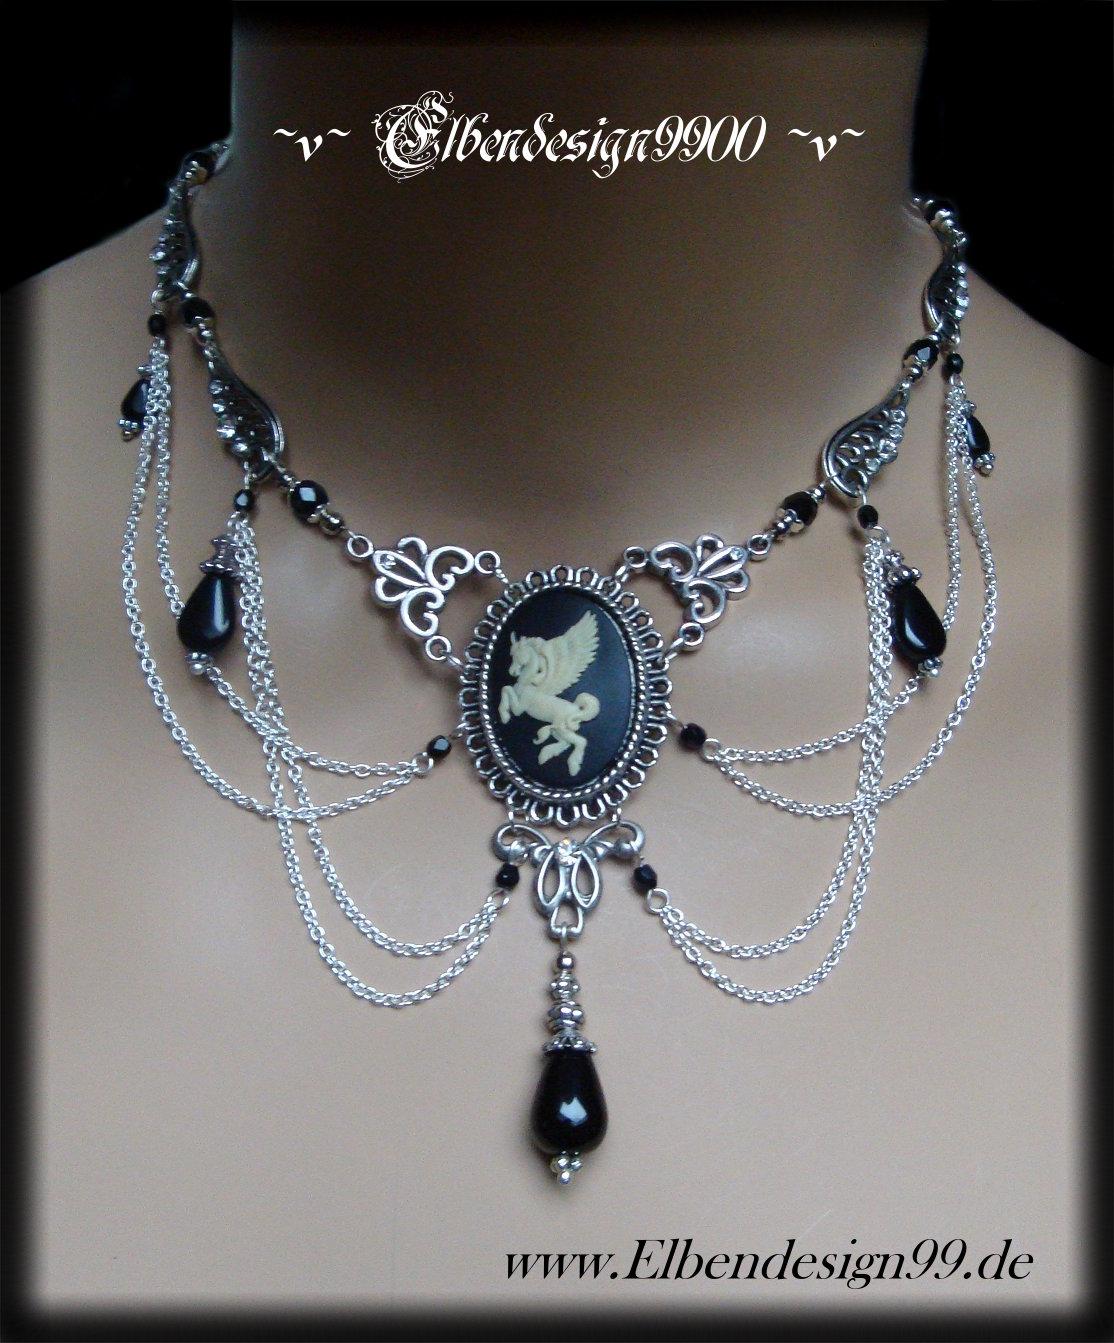 ^v^Stirnschmuck*Birdskull*Gothic*LARP*circlet*medieval*Tiara*pagan*Wicca*WGT^v^